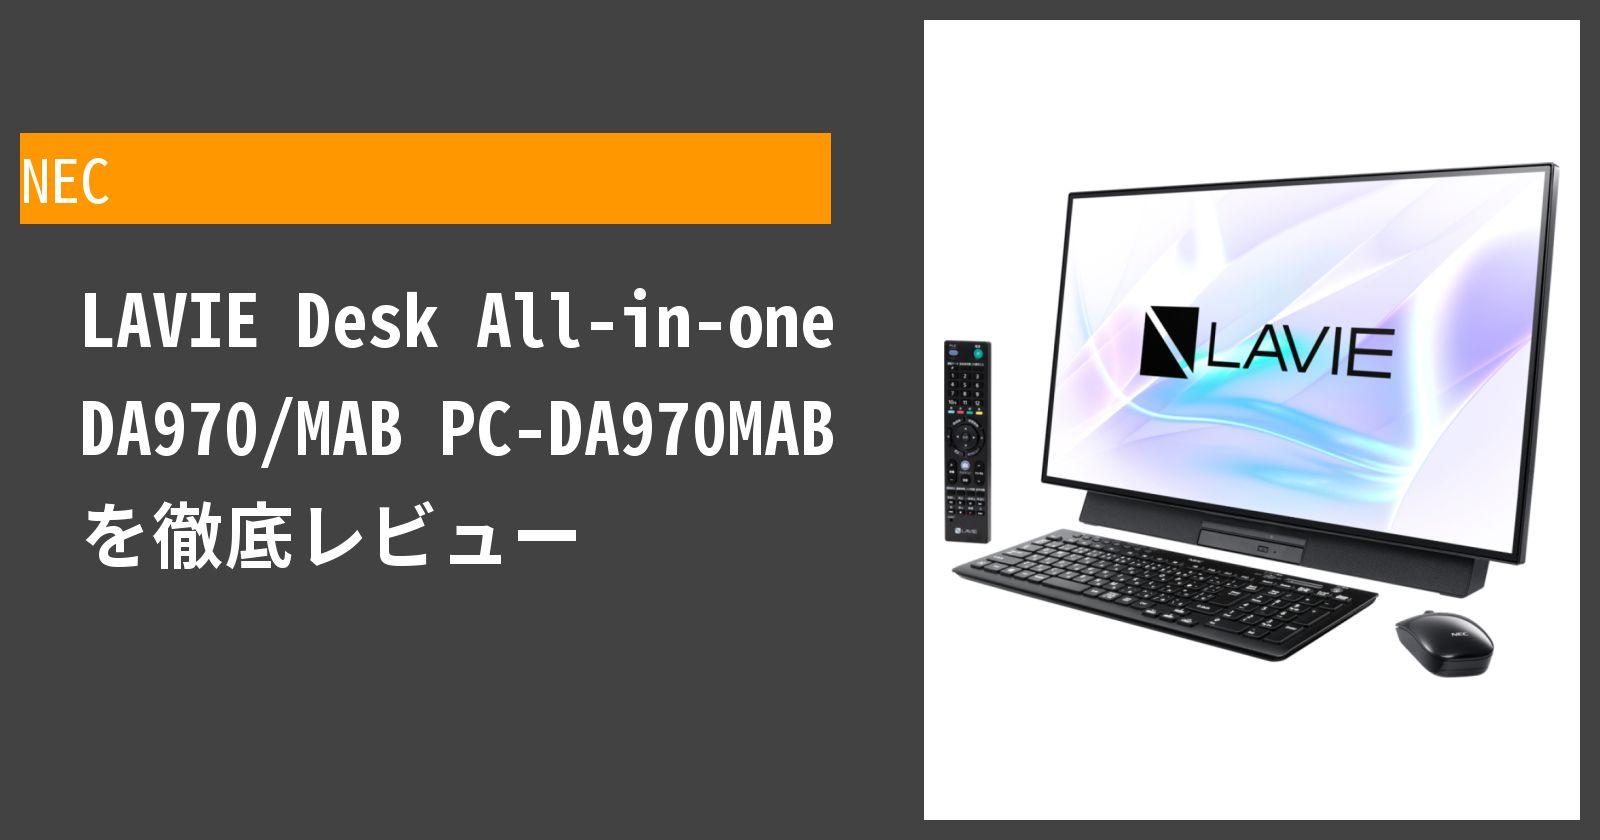 LAVIE Desk All-in-one DA970/MAB PC-DA970MABを徹底評価